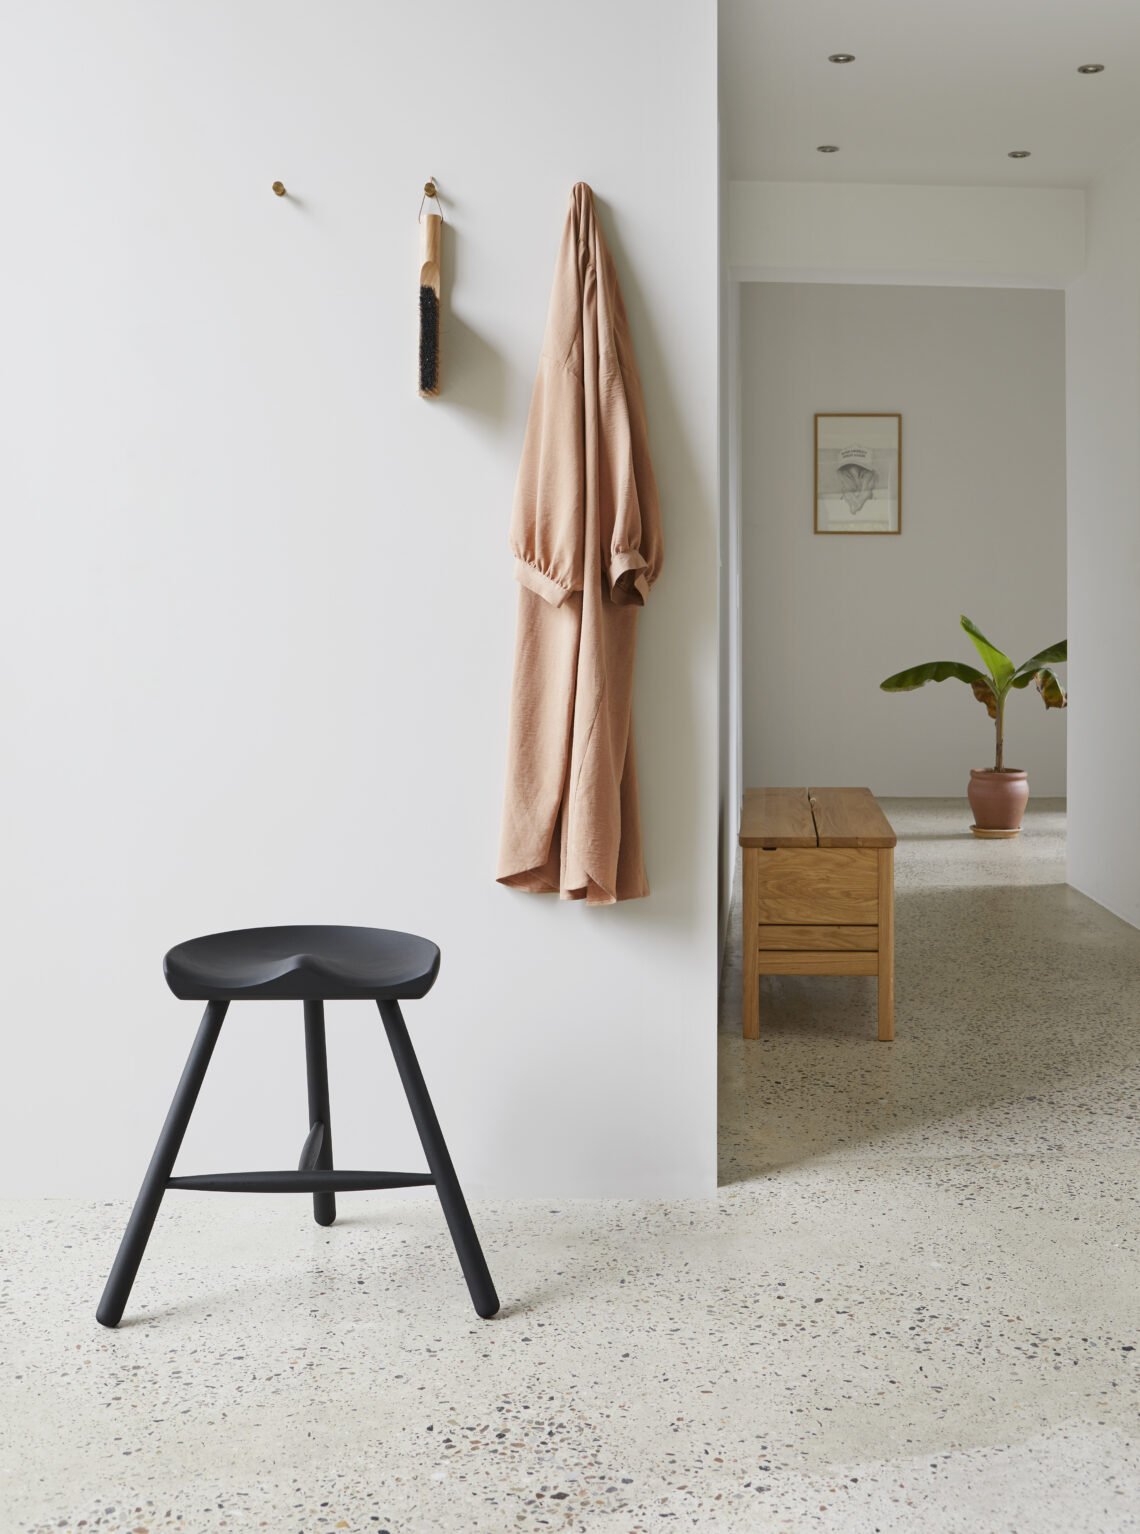 Form & Refine schoemaker chair 49 zwart krukje